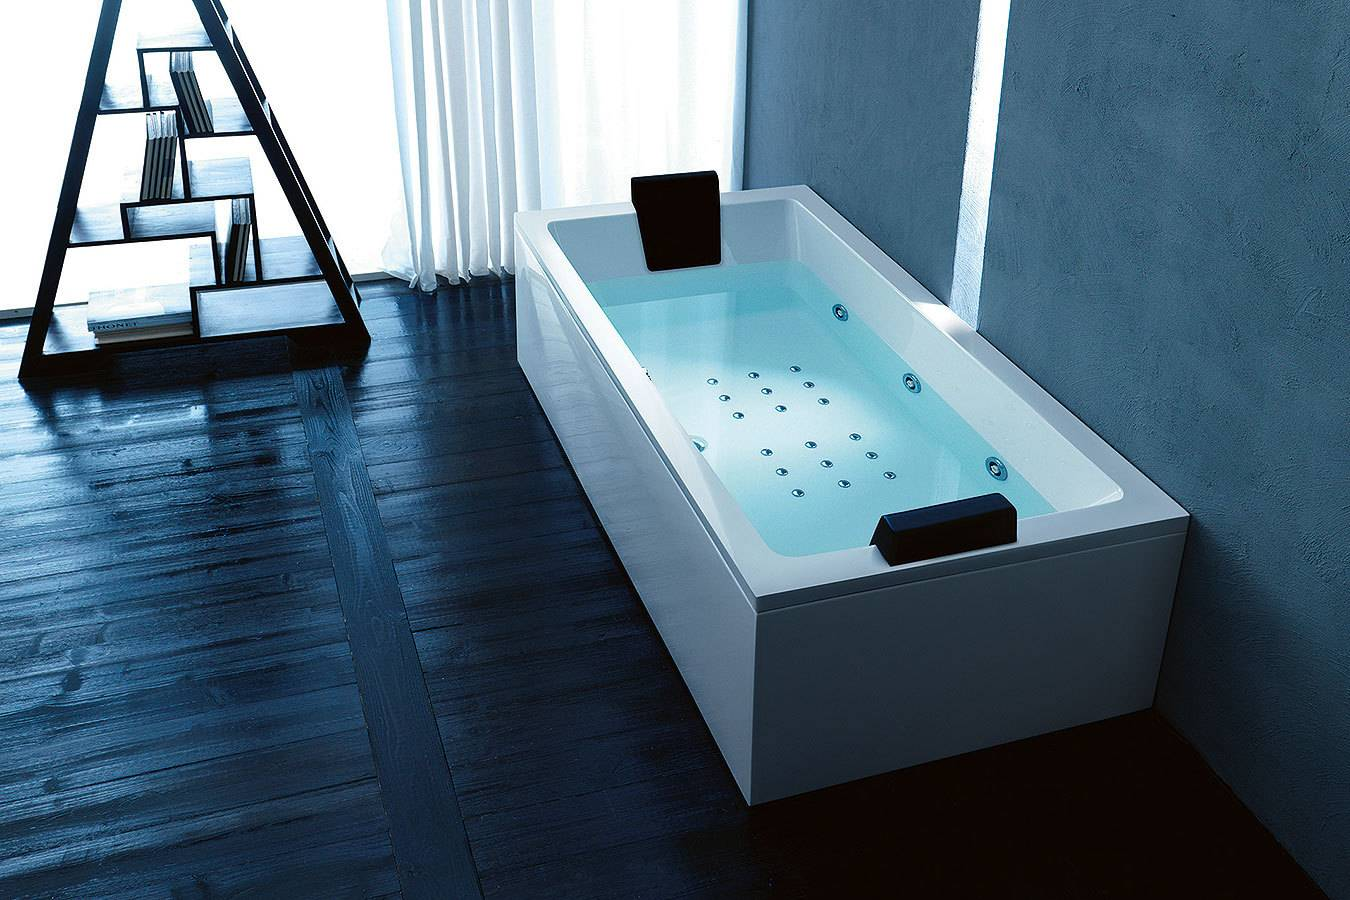 Vasca Da Bagno Quadrata Prezzi : Vasca da bagno treesse quadra casaomnia